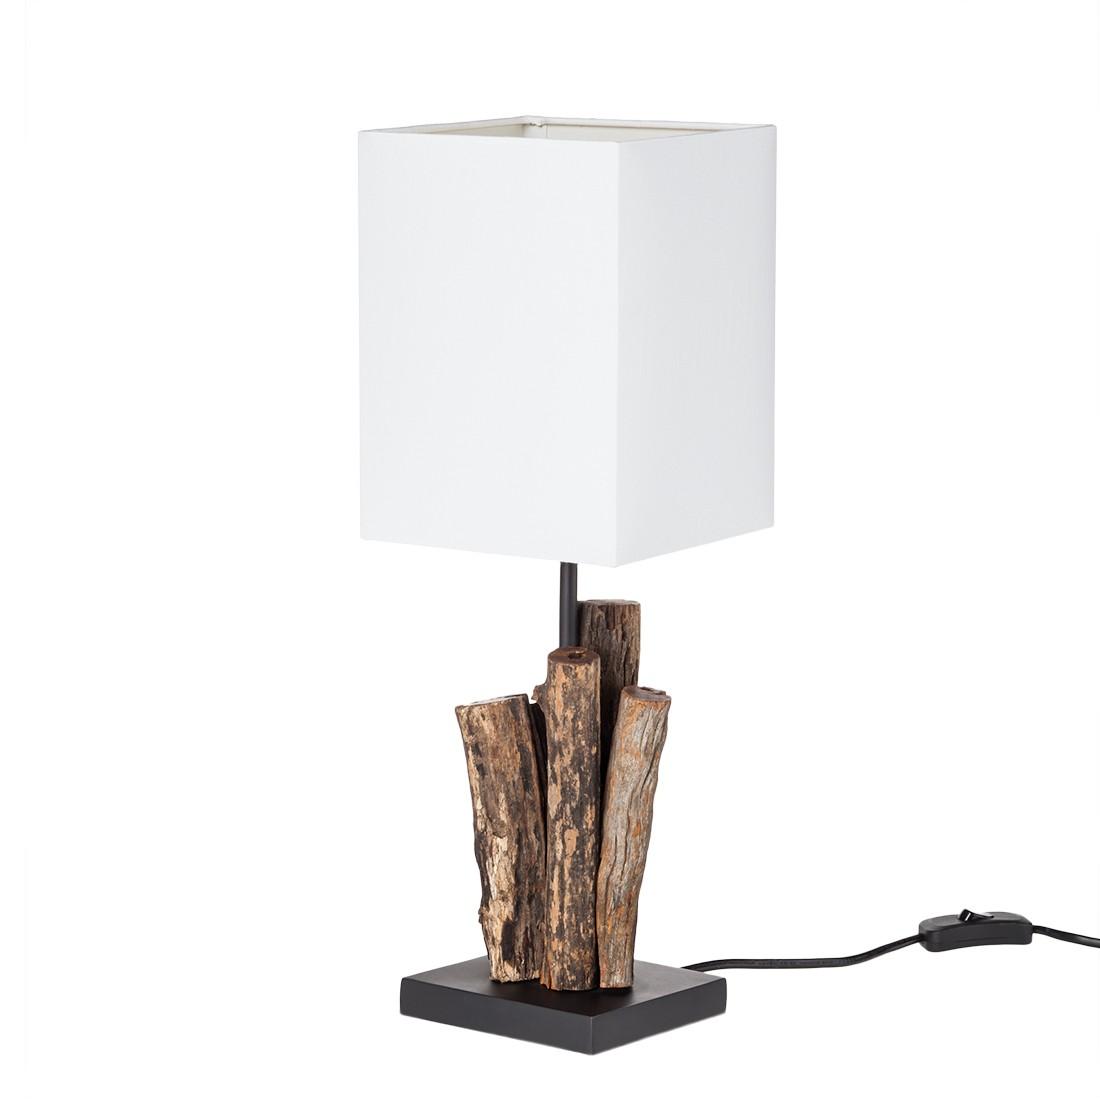 energie  A++, Tafellamp Abuja - houtkleurig - wit, Paul Neuhaus